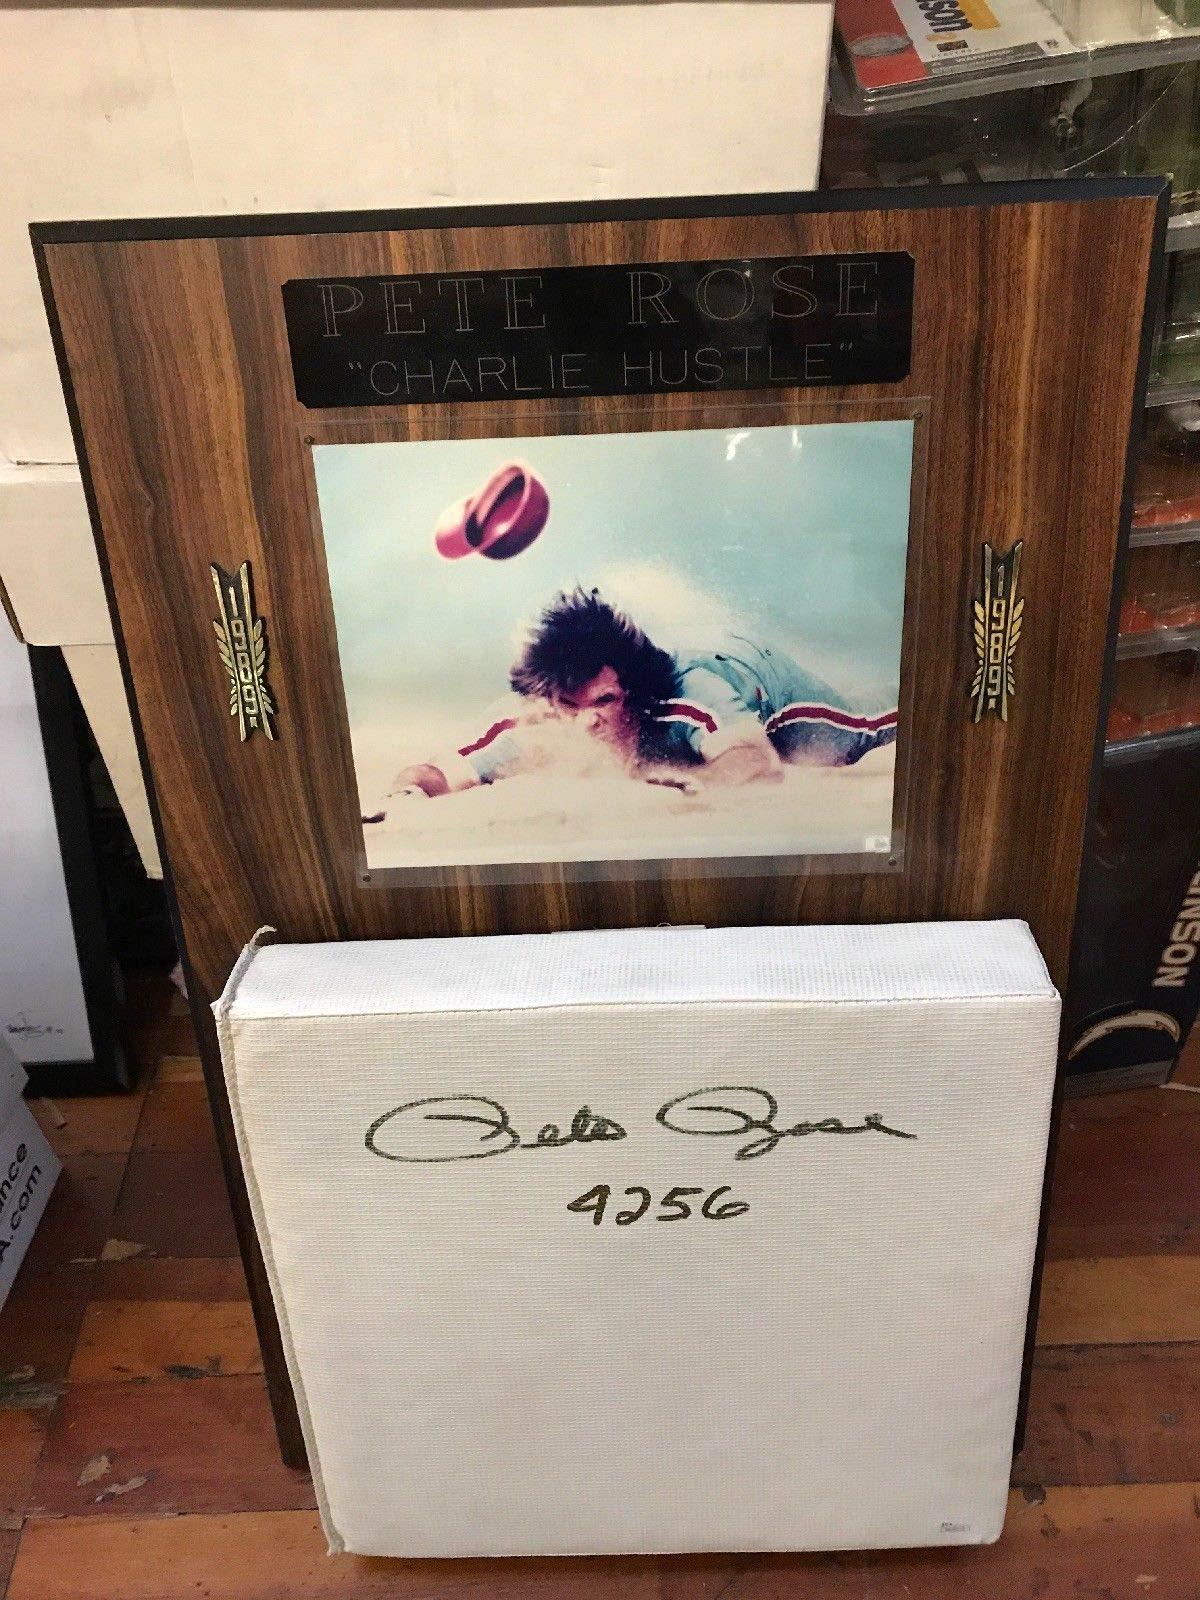 Pete Rose Autographed Signed Base 4256 Charlie Hustle JSA Authentication